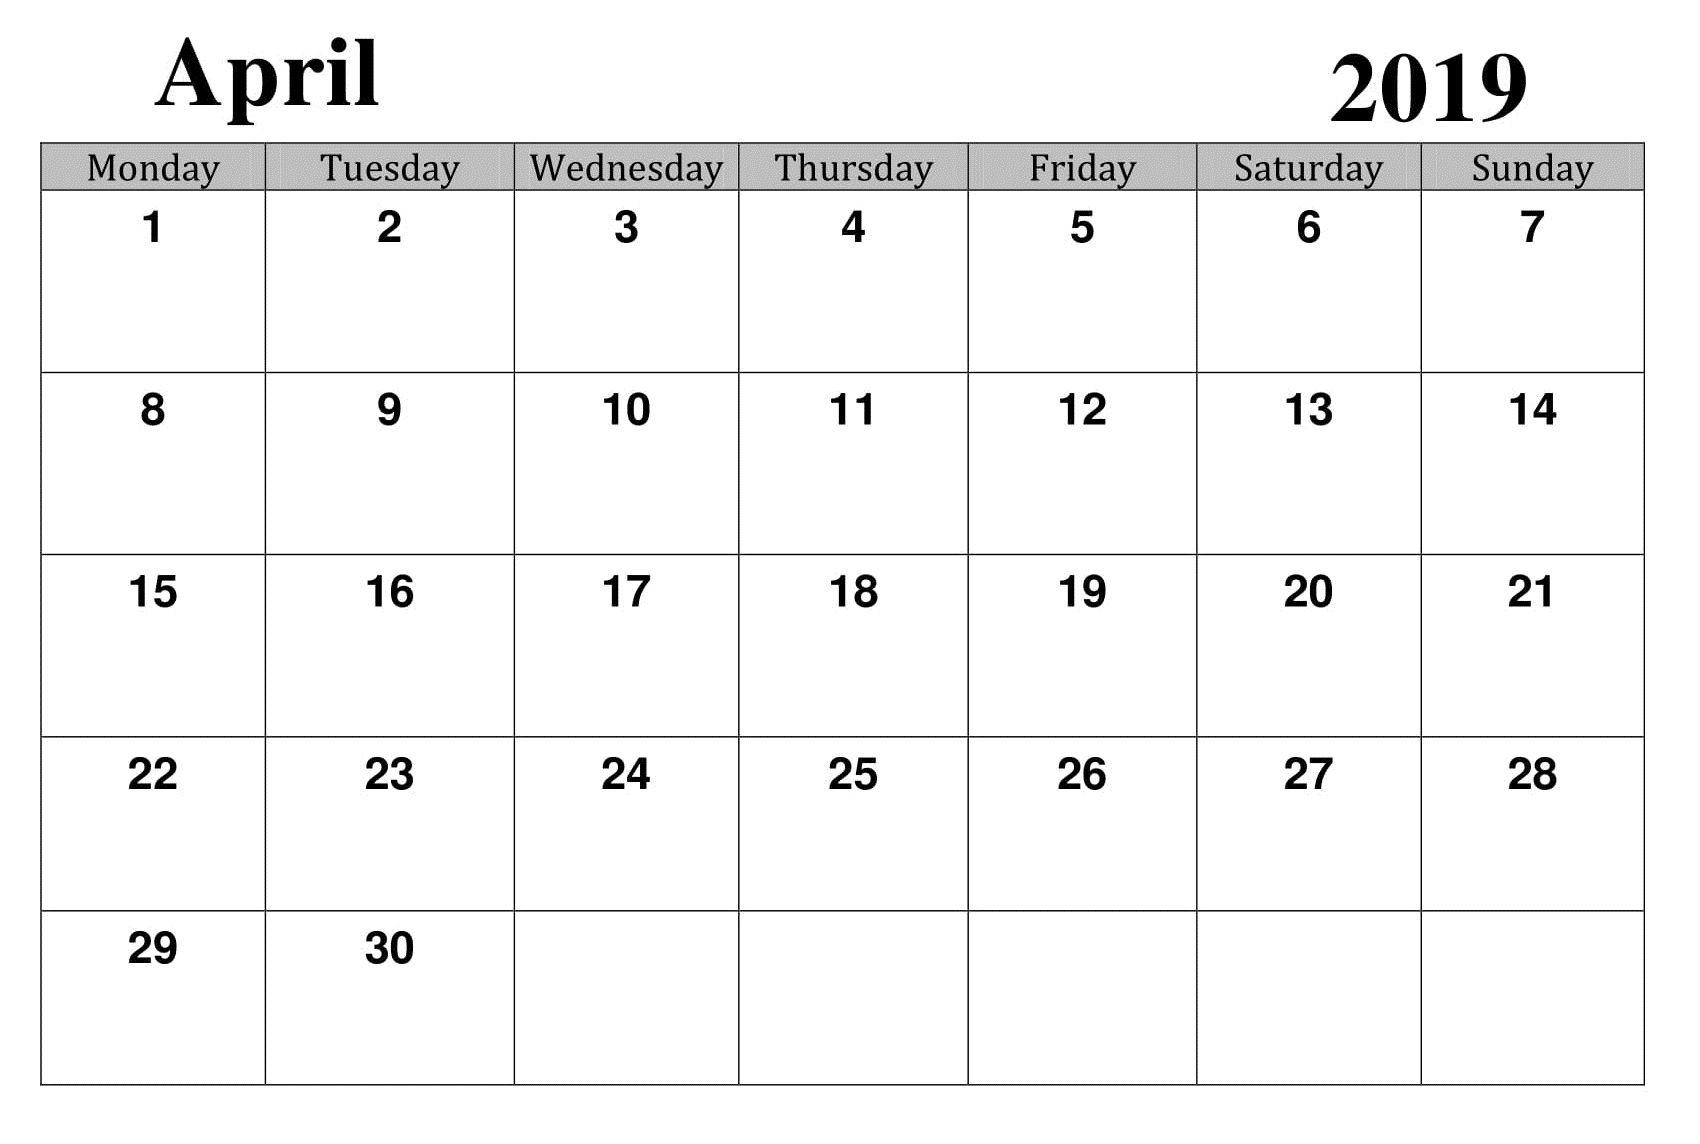 April 2019 Printable Template Calendar | Blank Calendar in Google Calendar Printable Template